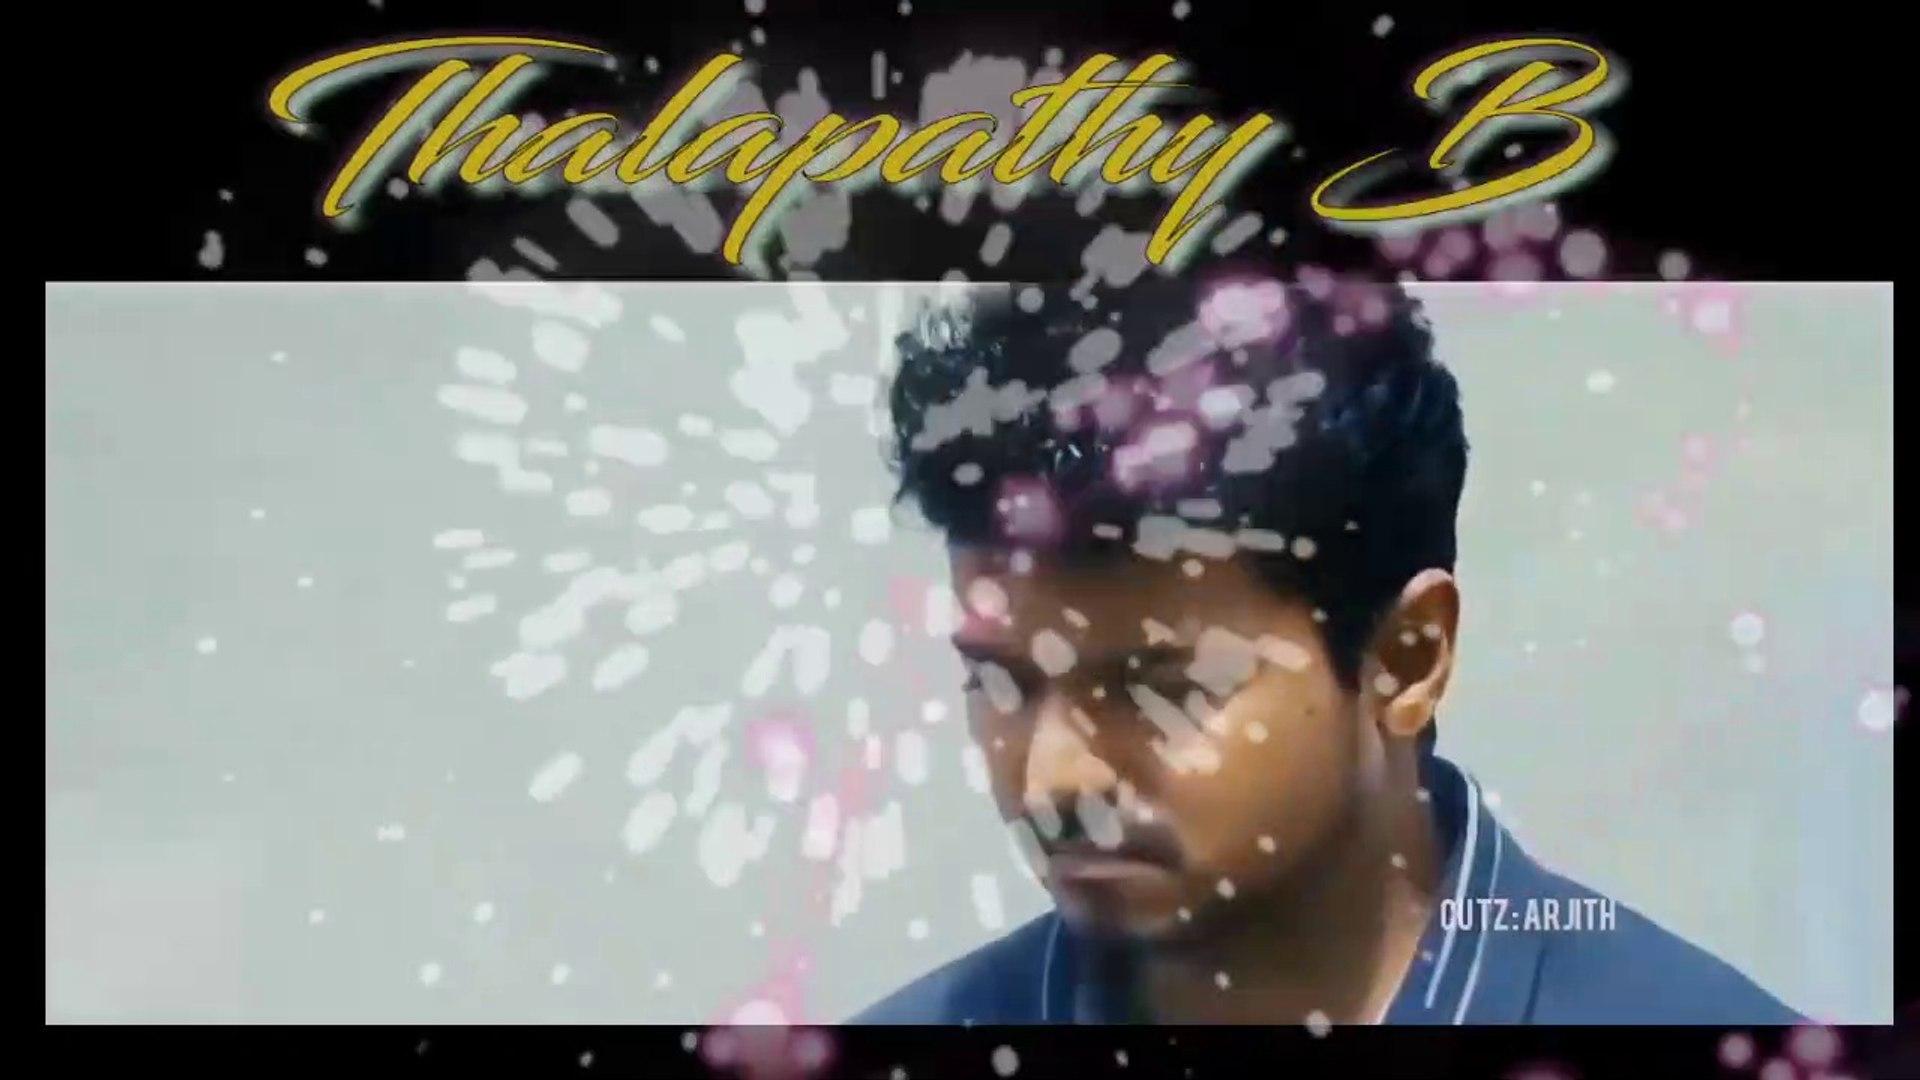 vijay birthday whatsapp status|thalapathy Vijay status|subscribe free|thalapathy vijay birthday stat